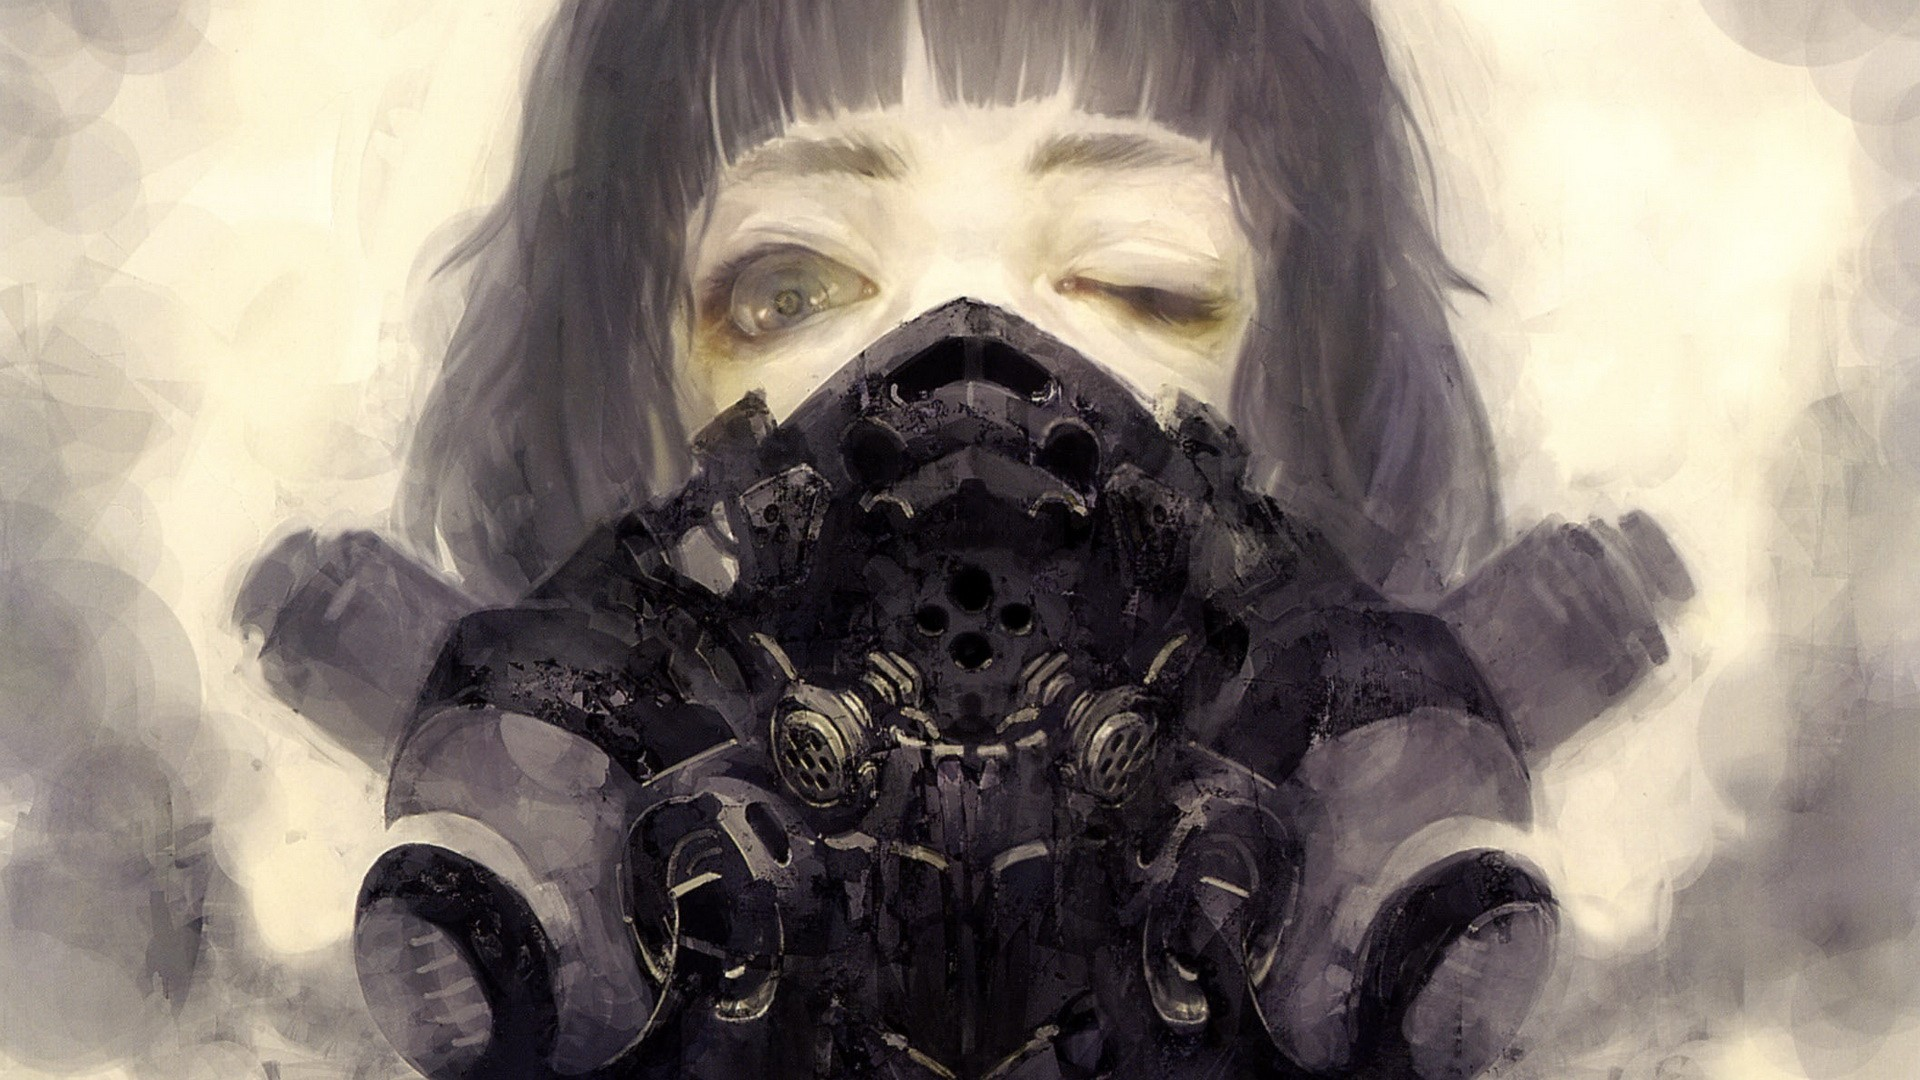 Gas Mask • Resolution: 1920 x 1080 • HD Anime Wallpaper Art